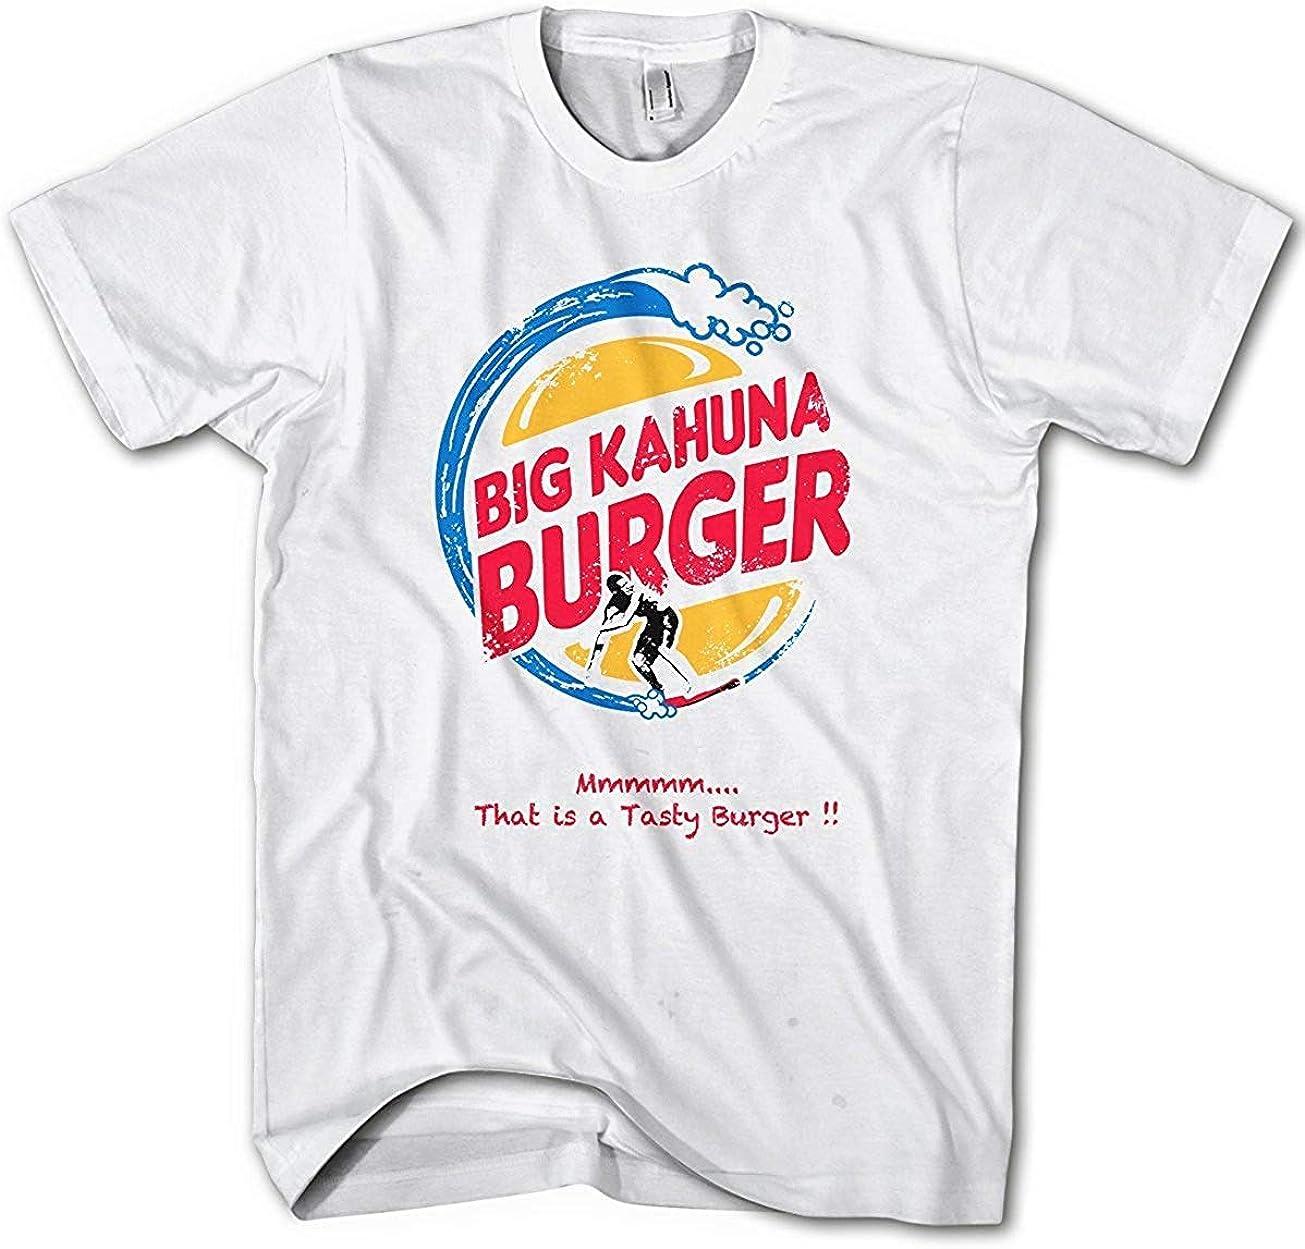 T-Shirt Uomo Big Kahuna Burger Fiction Movie Pulp